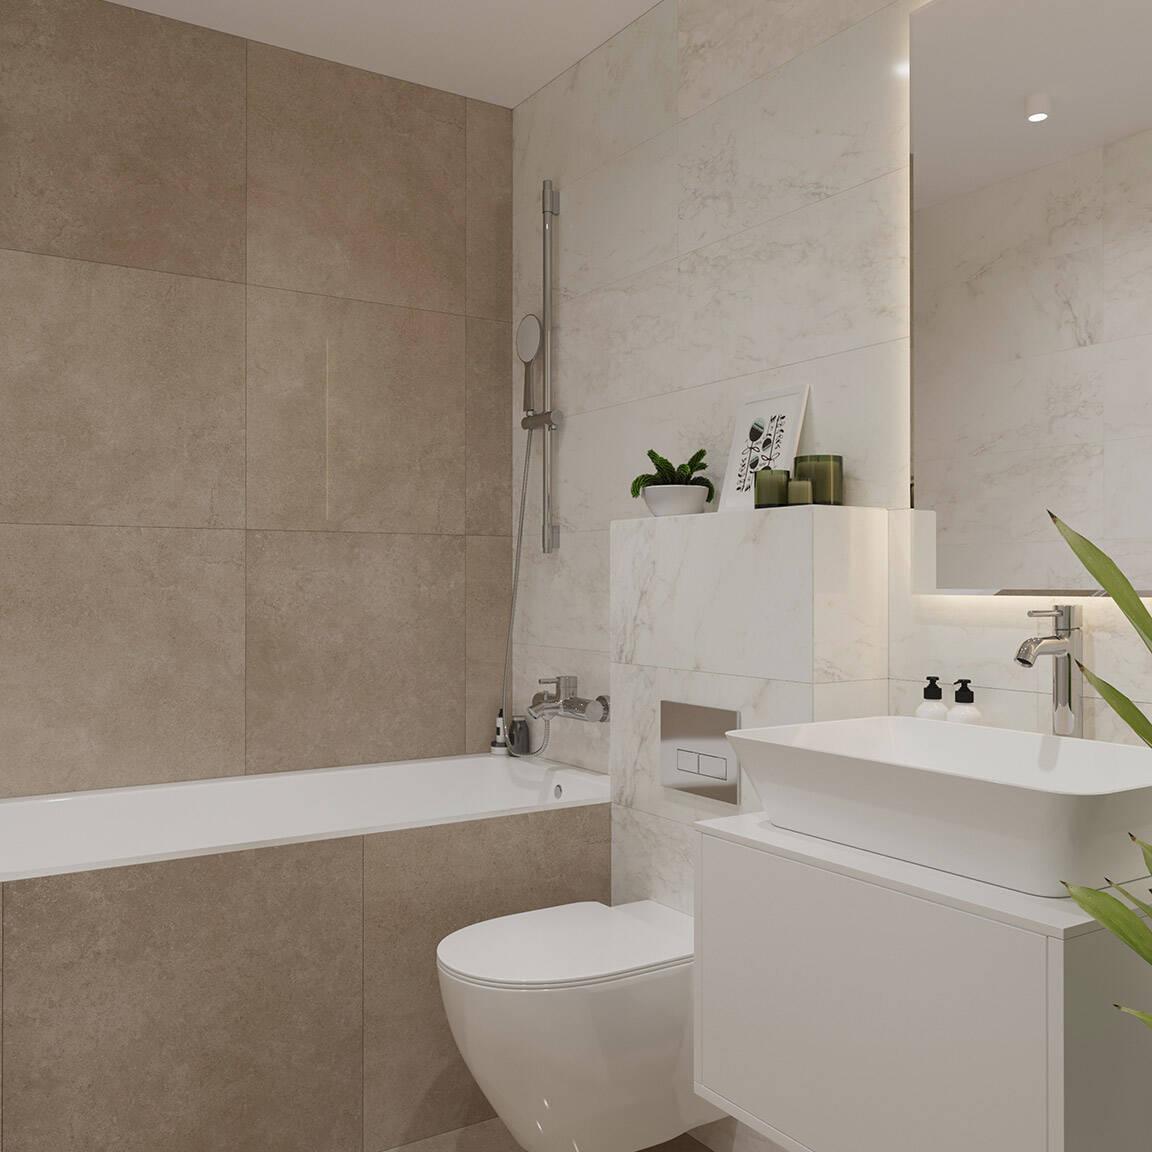 Catedral Residence - Bathroom - Marazzi Ceramic tiles - 13